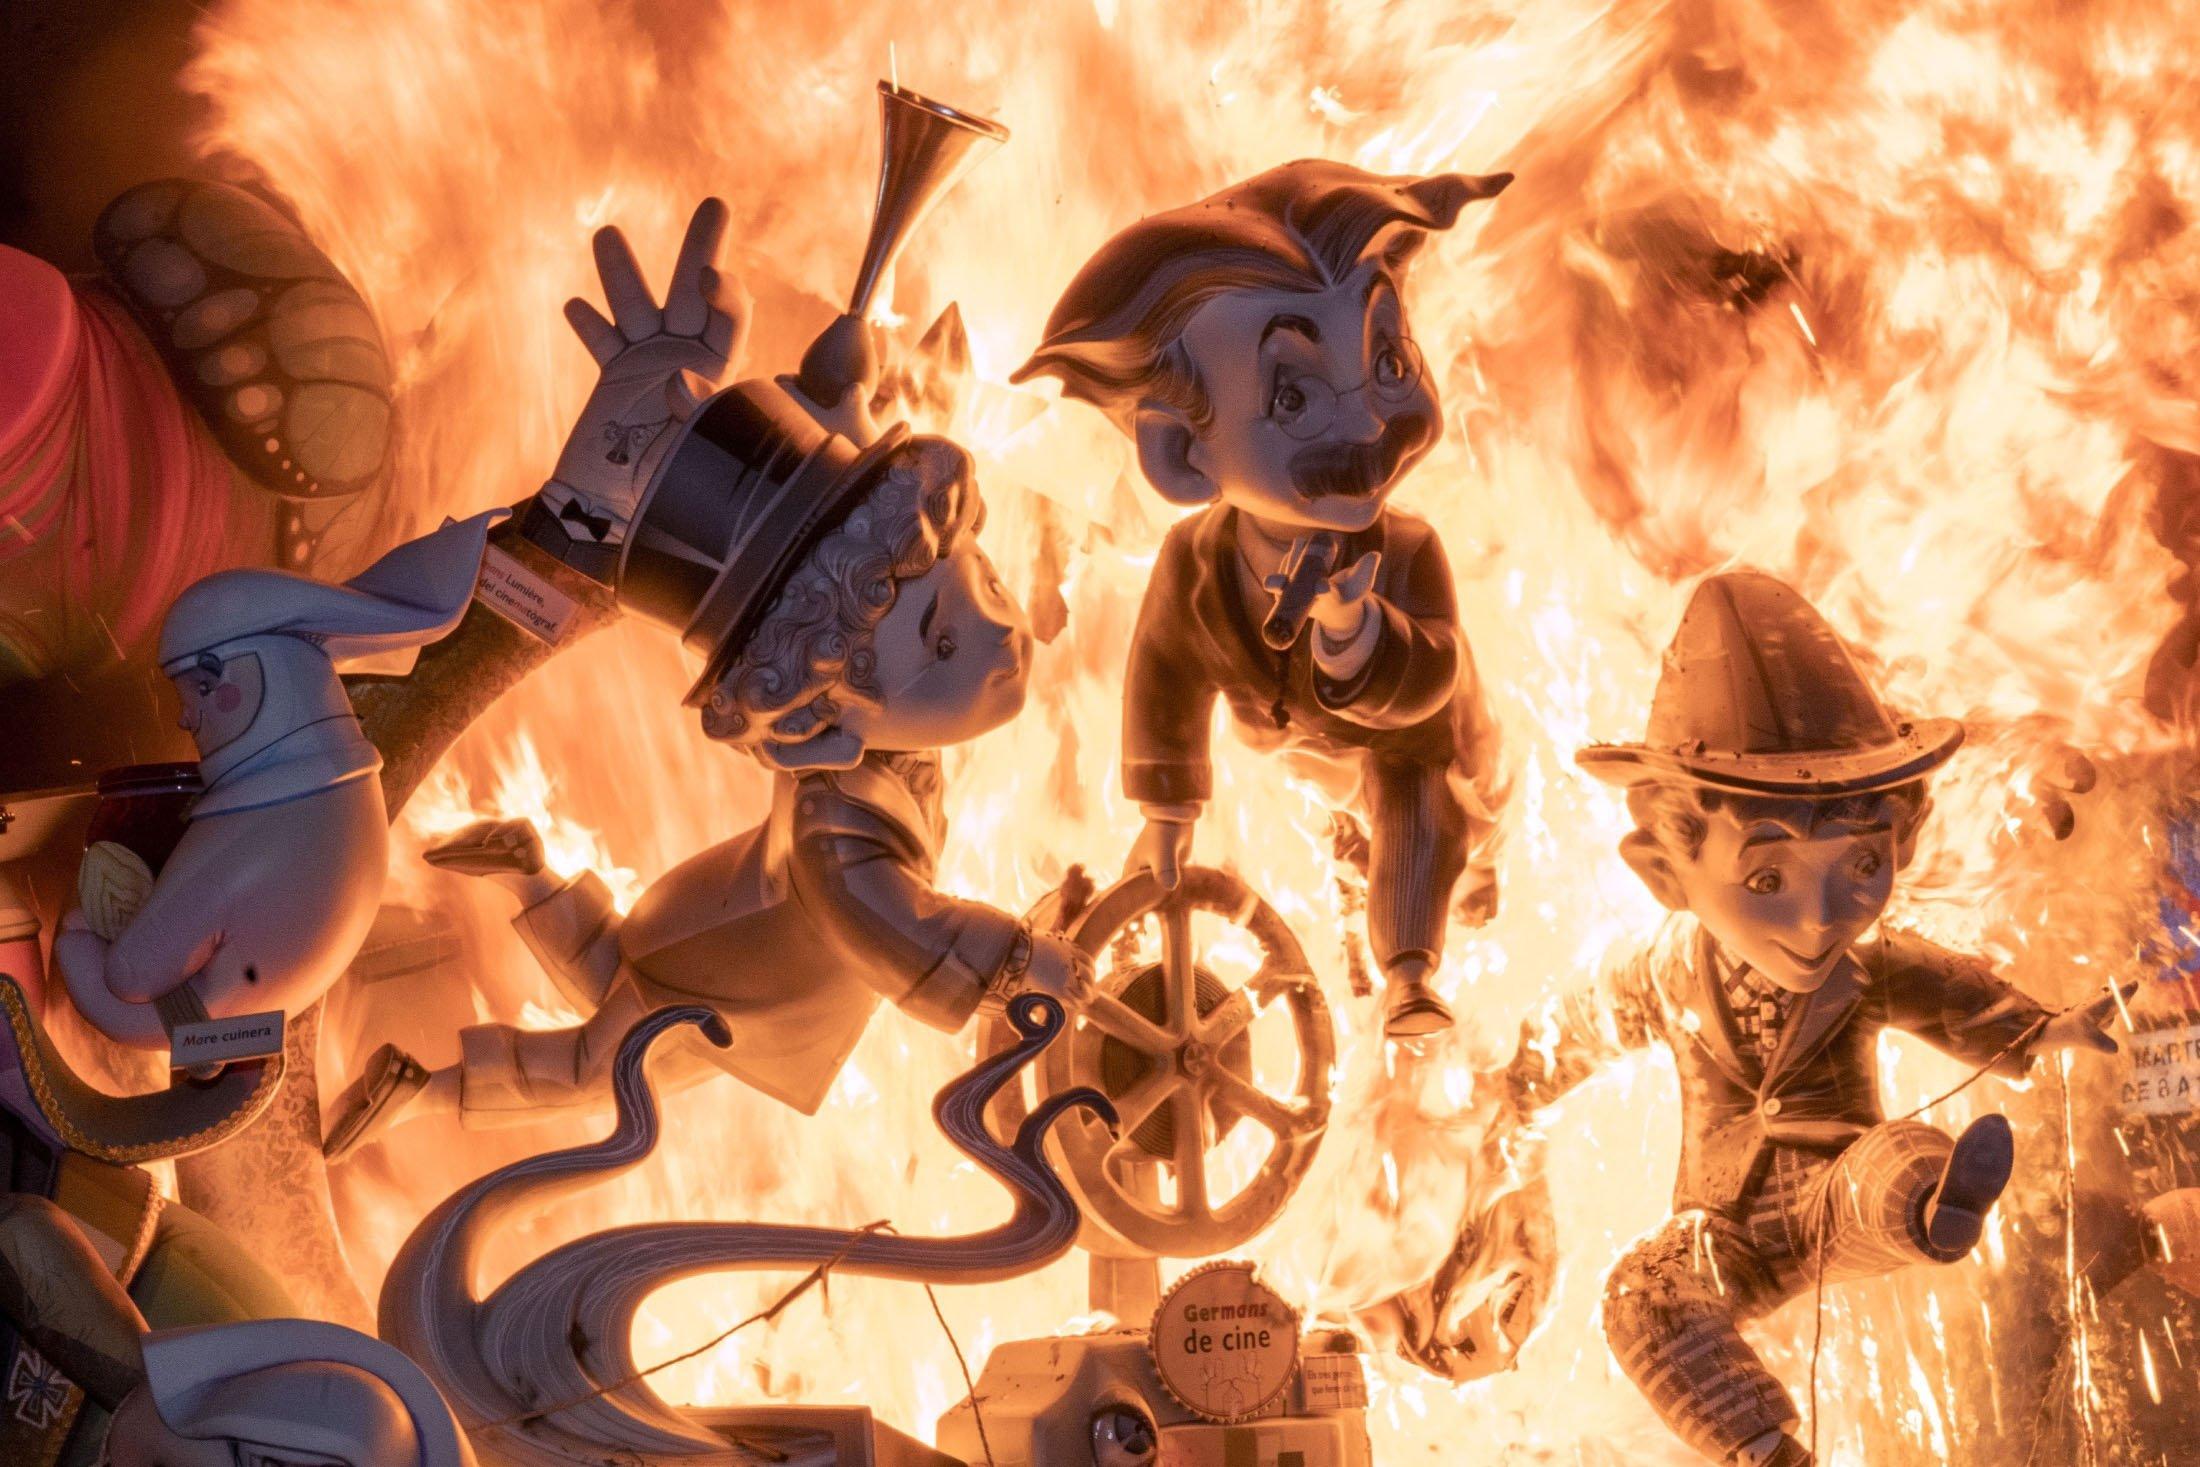 A falla burns during the traditional Fallas festival in Valencia, Spain, Sept. 5, 2021. (AFP Photo)